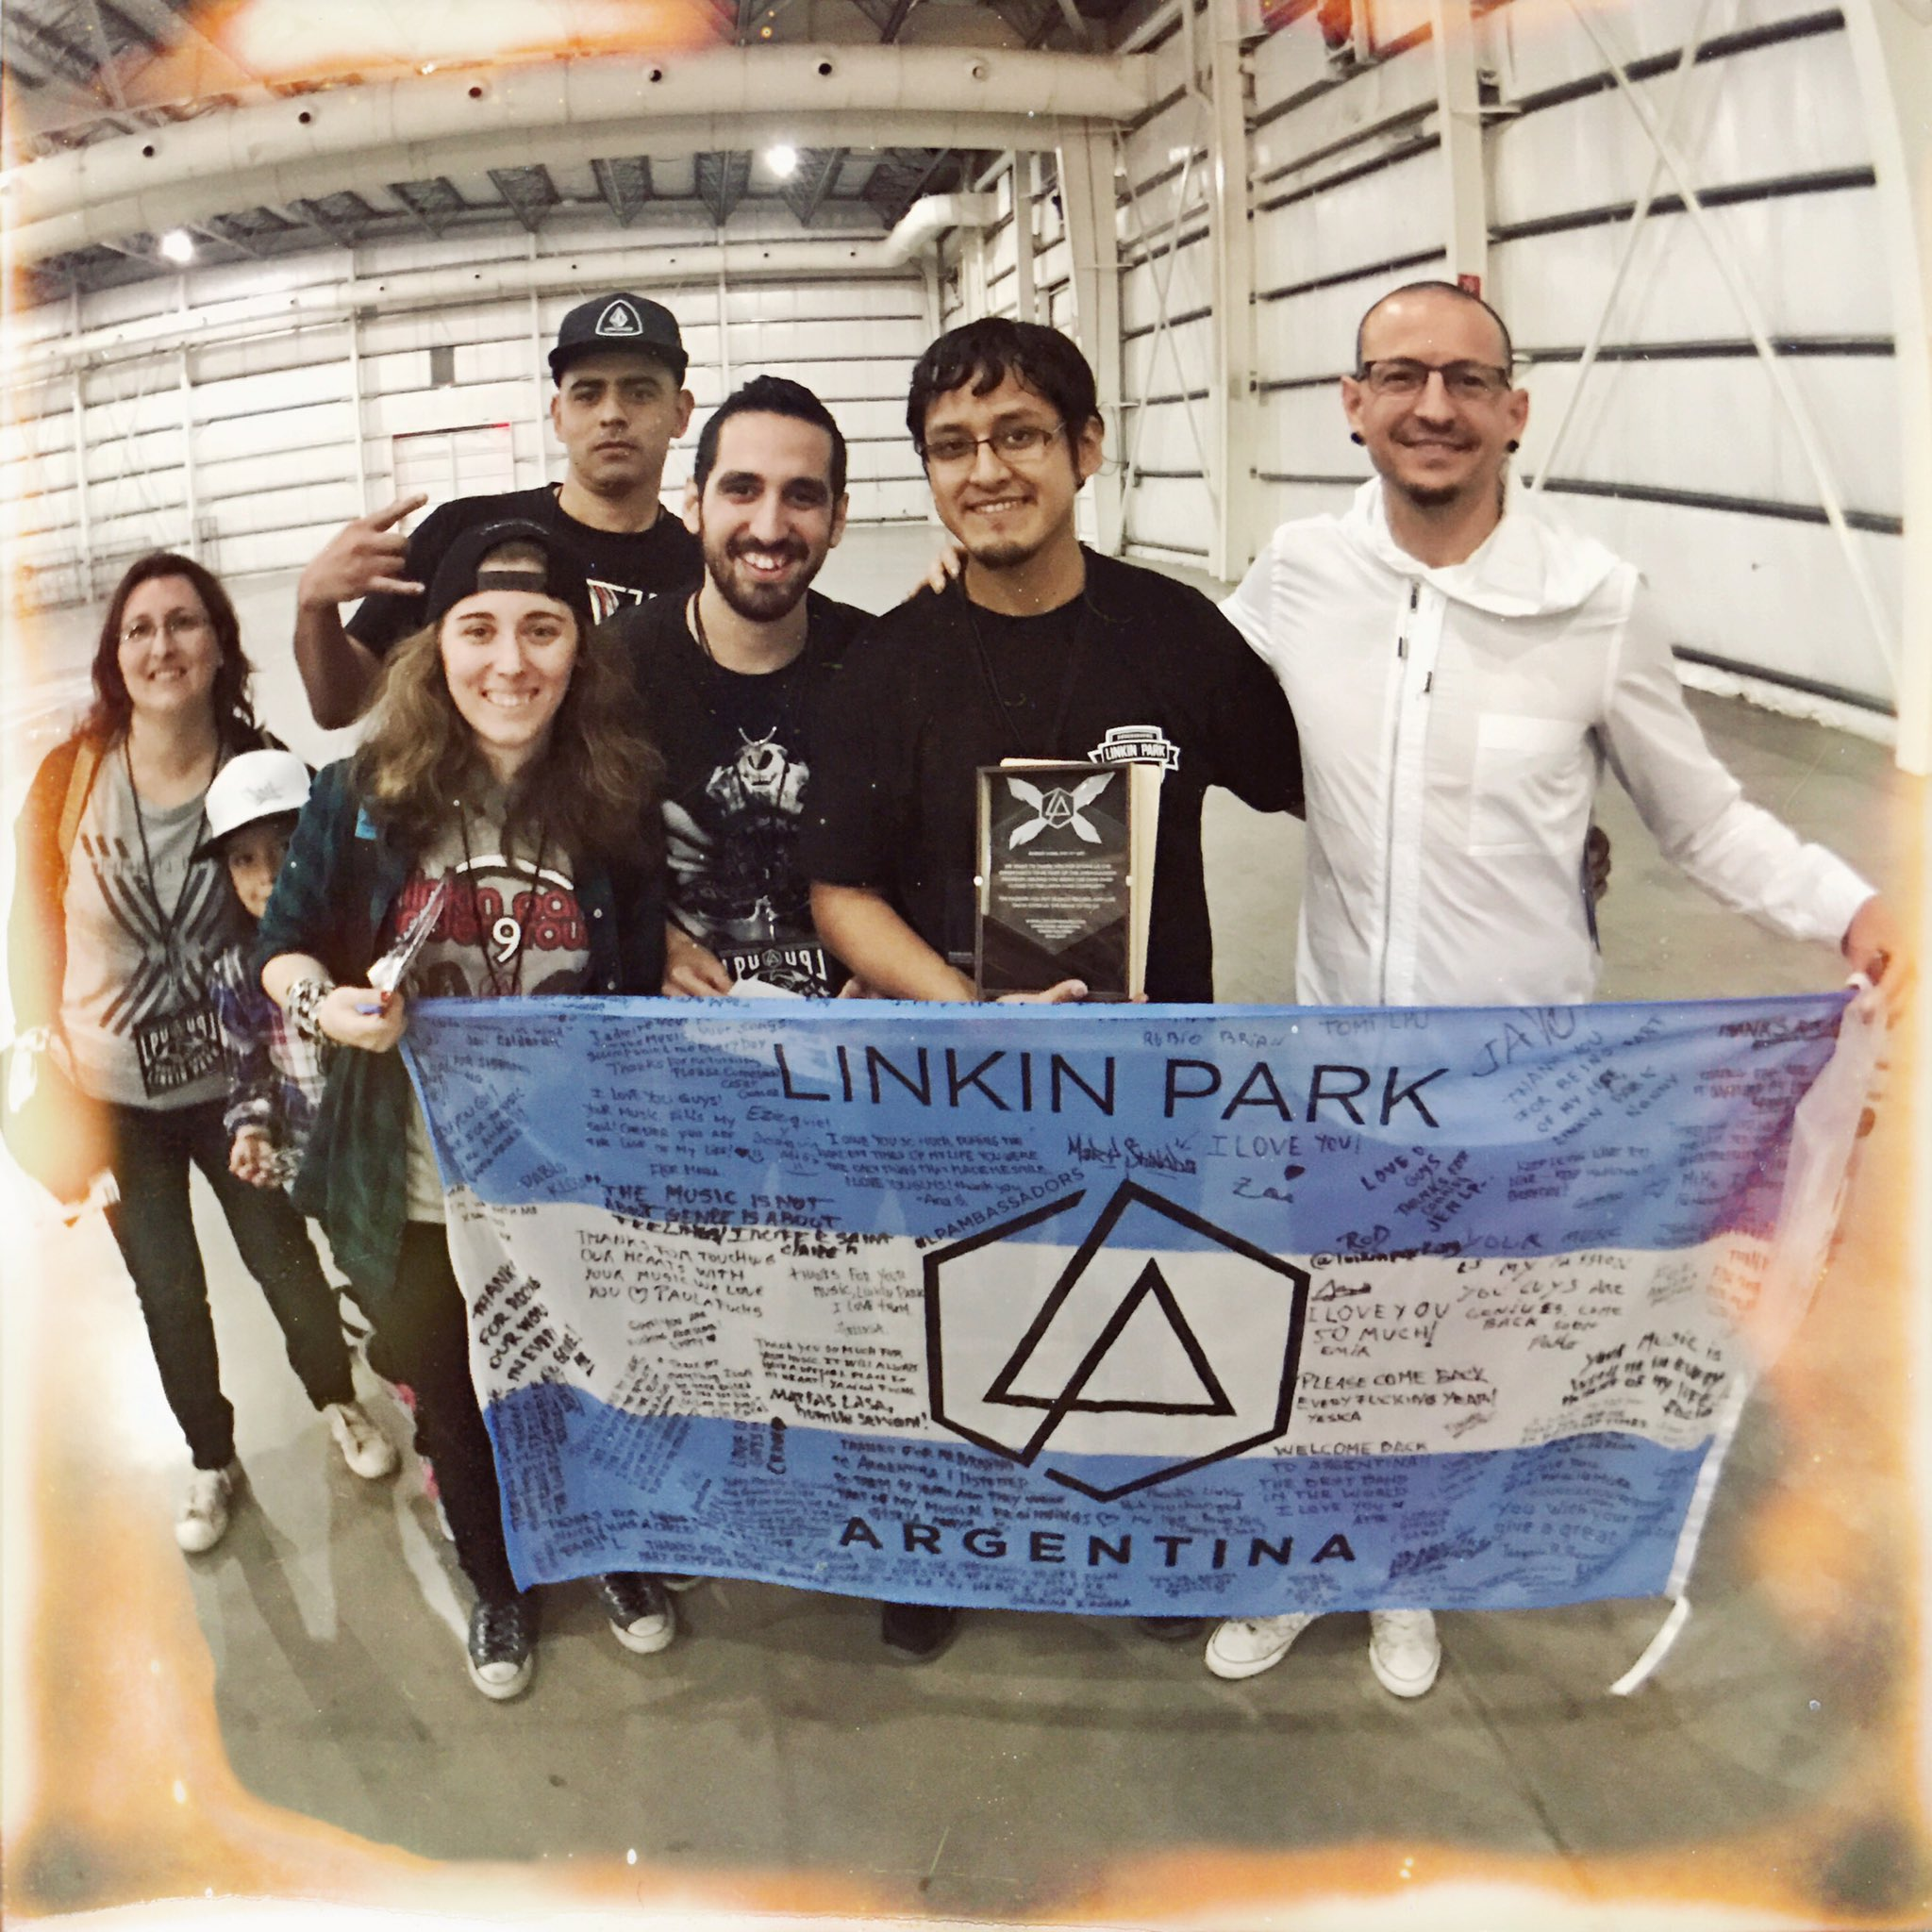 Amigos en Argentina @MaximusFestArg #MaximusFestival https://t.co/2CIwGMOPOw